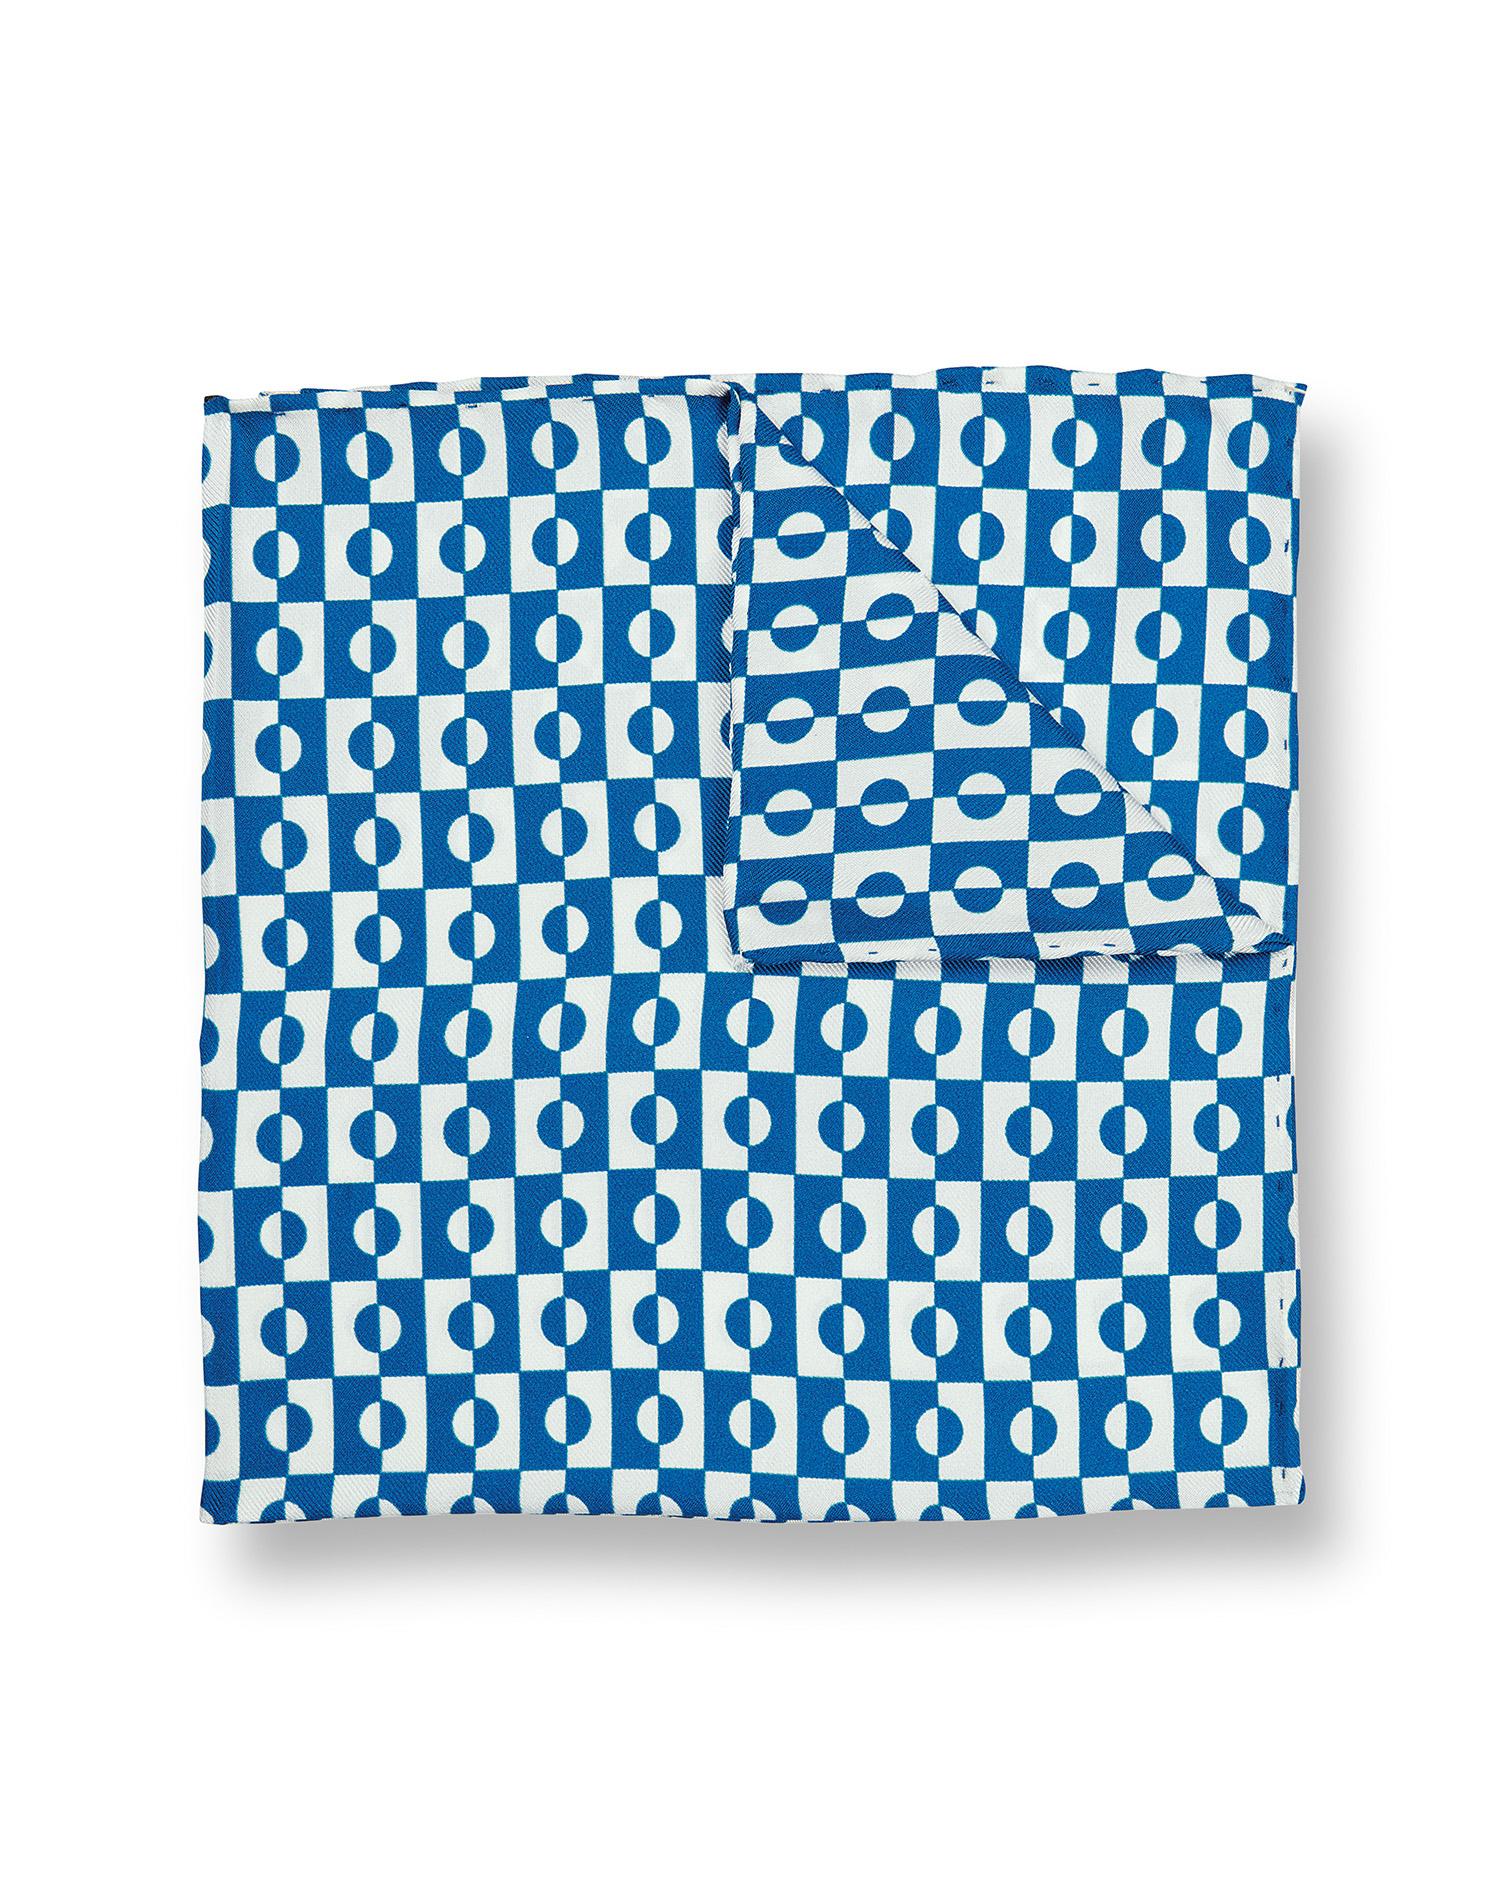 Image of Charles Tyrwhitt Abstract Geometric Print Silk Pocket Square - Royal Blue & White by Charles Tyrwhitt